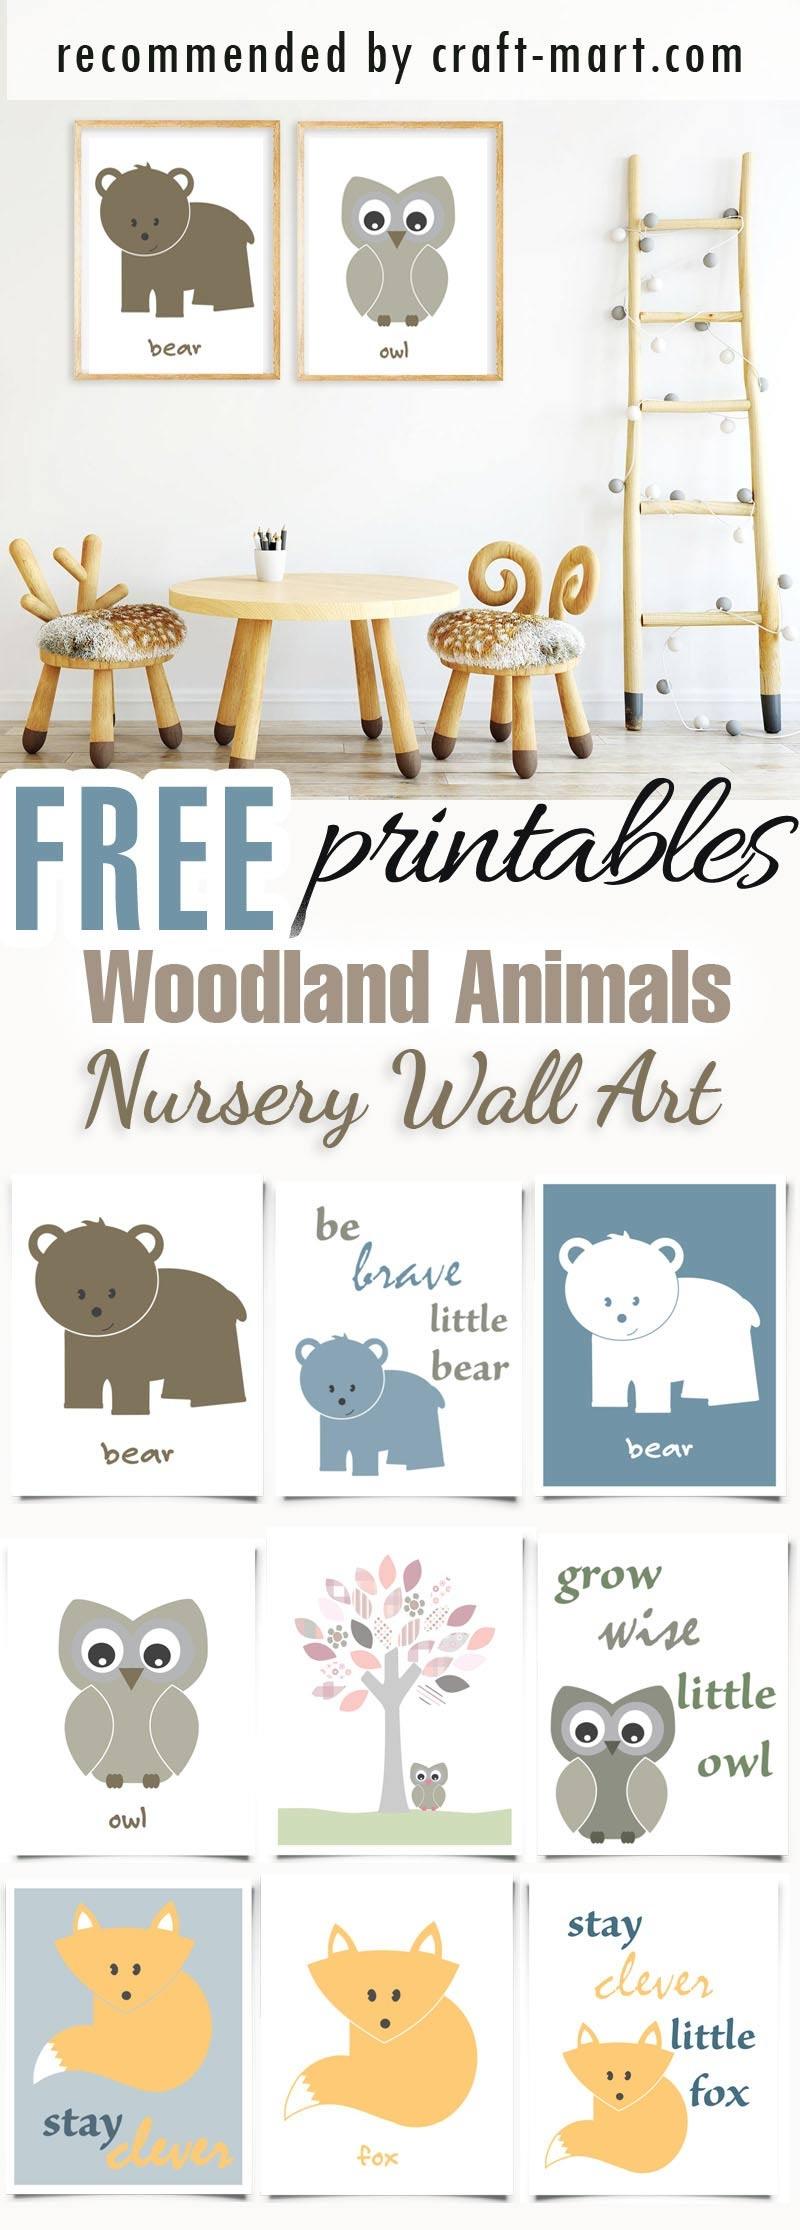 100+ Best Free Nursery Printables And Wall Art - Craft-Mart - Free Printable Woodland Animal Templates